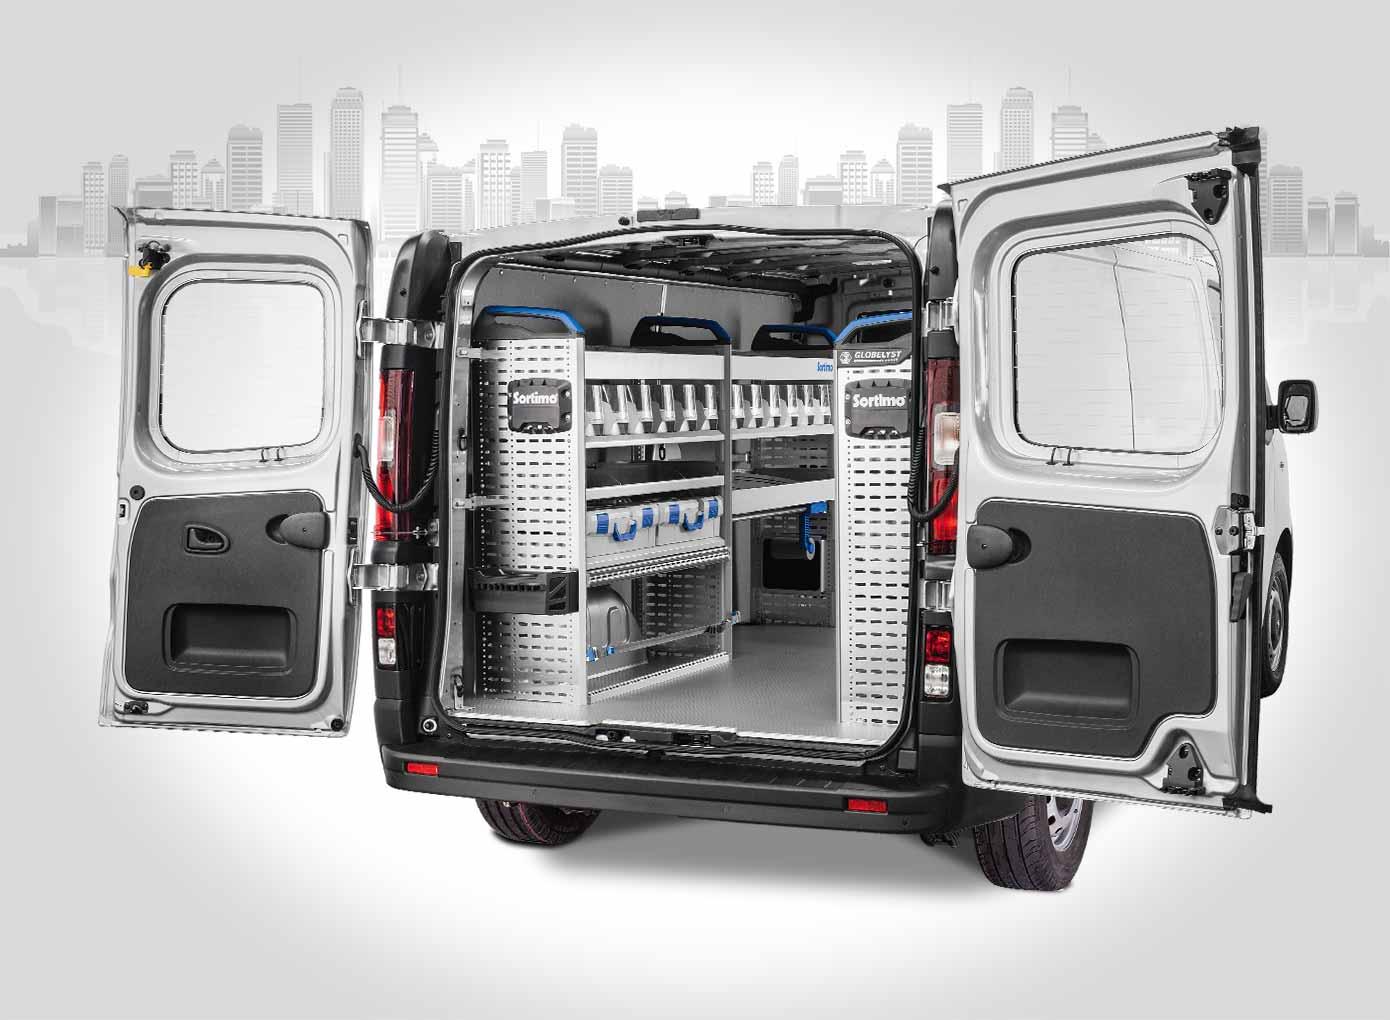 Opel Sortimo International Nissan Primastar Wiring Diagram Free Download To Dealership Search